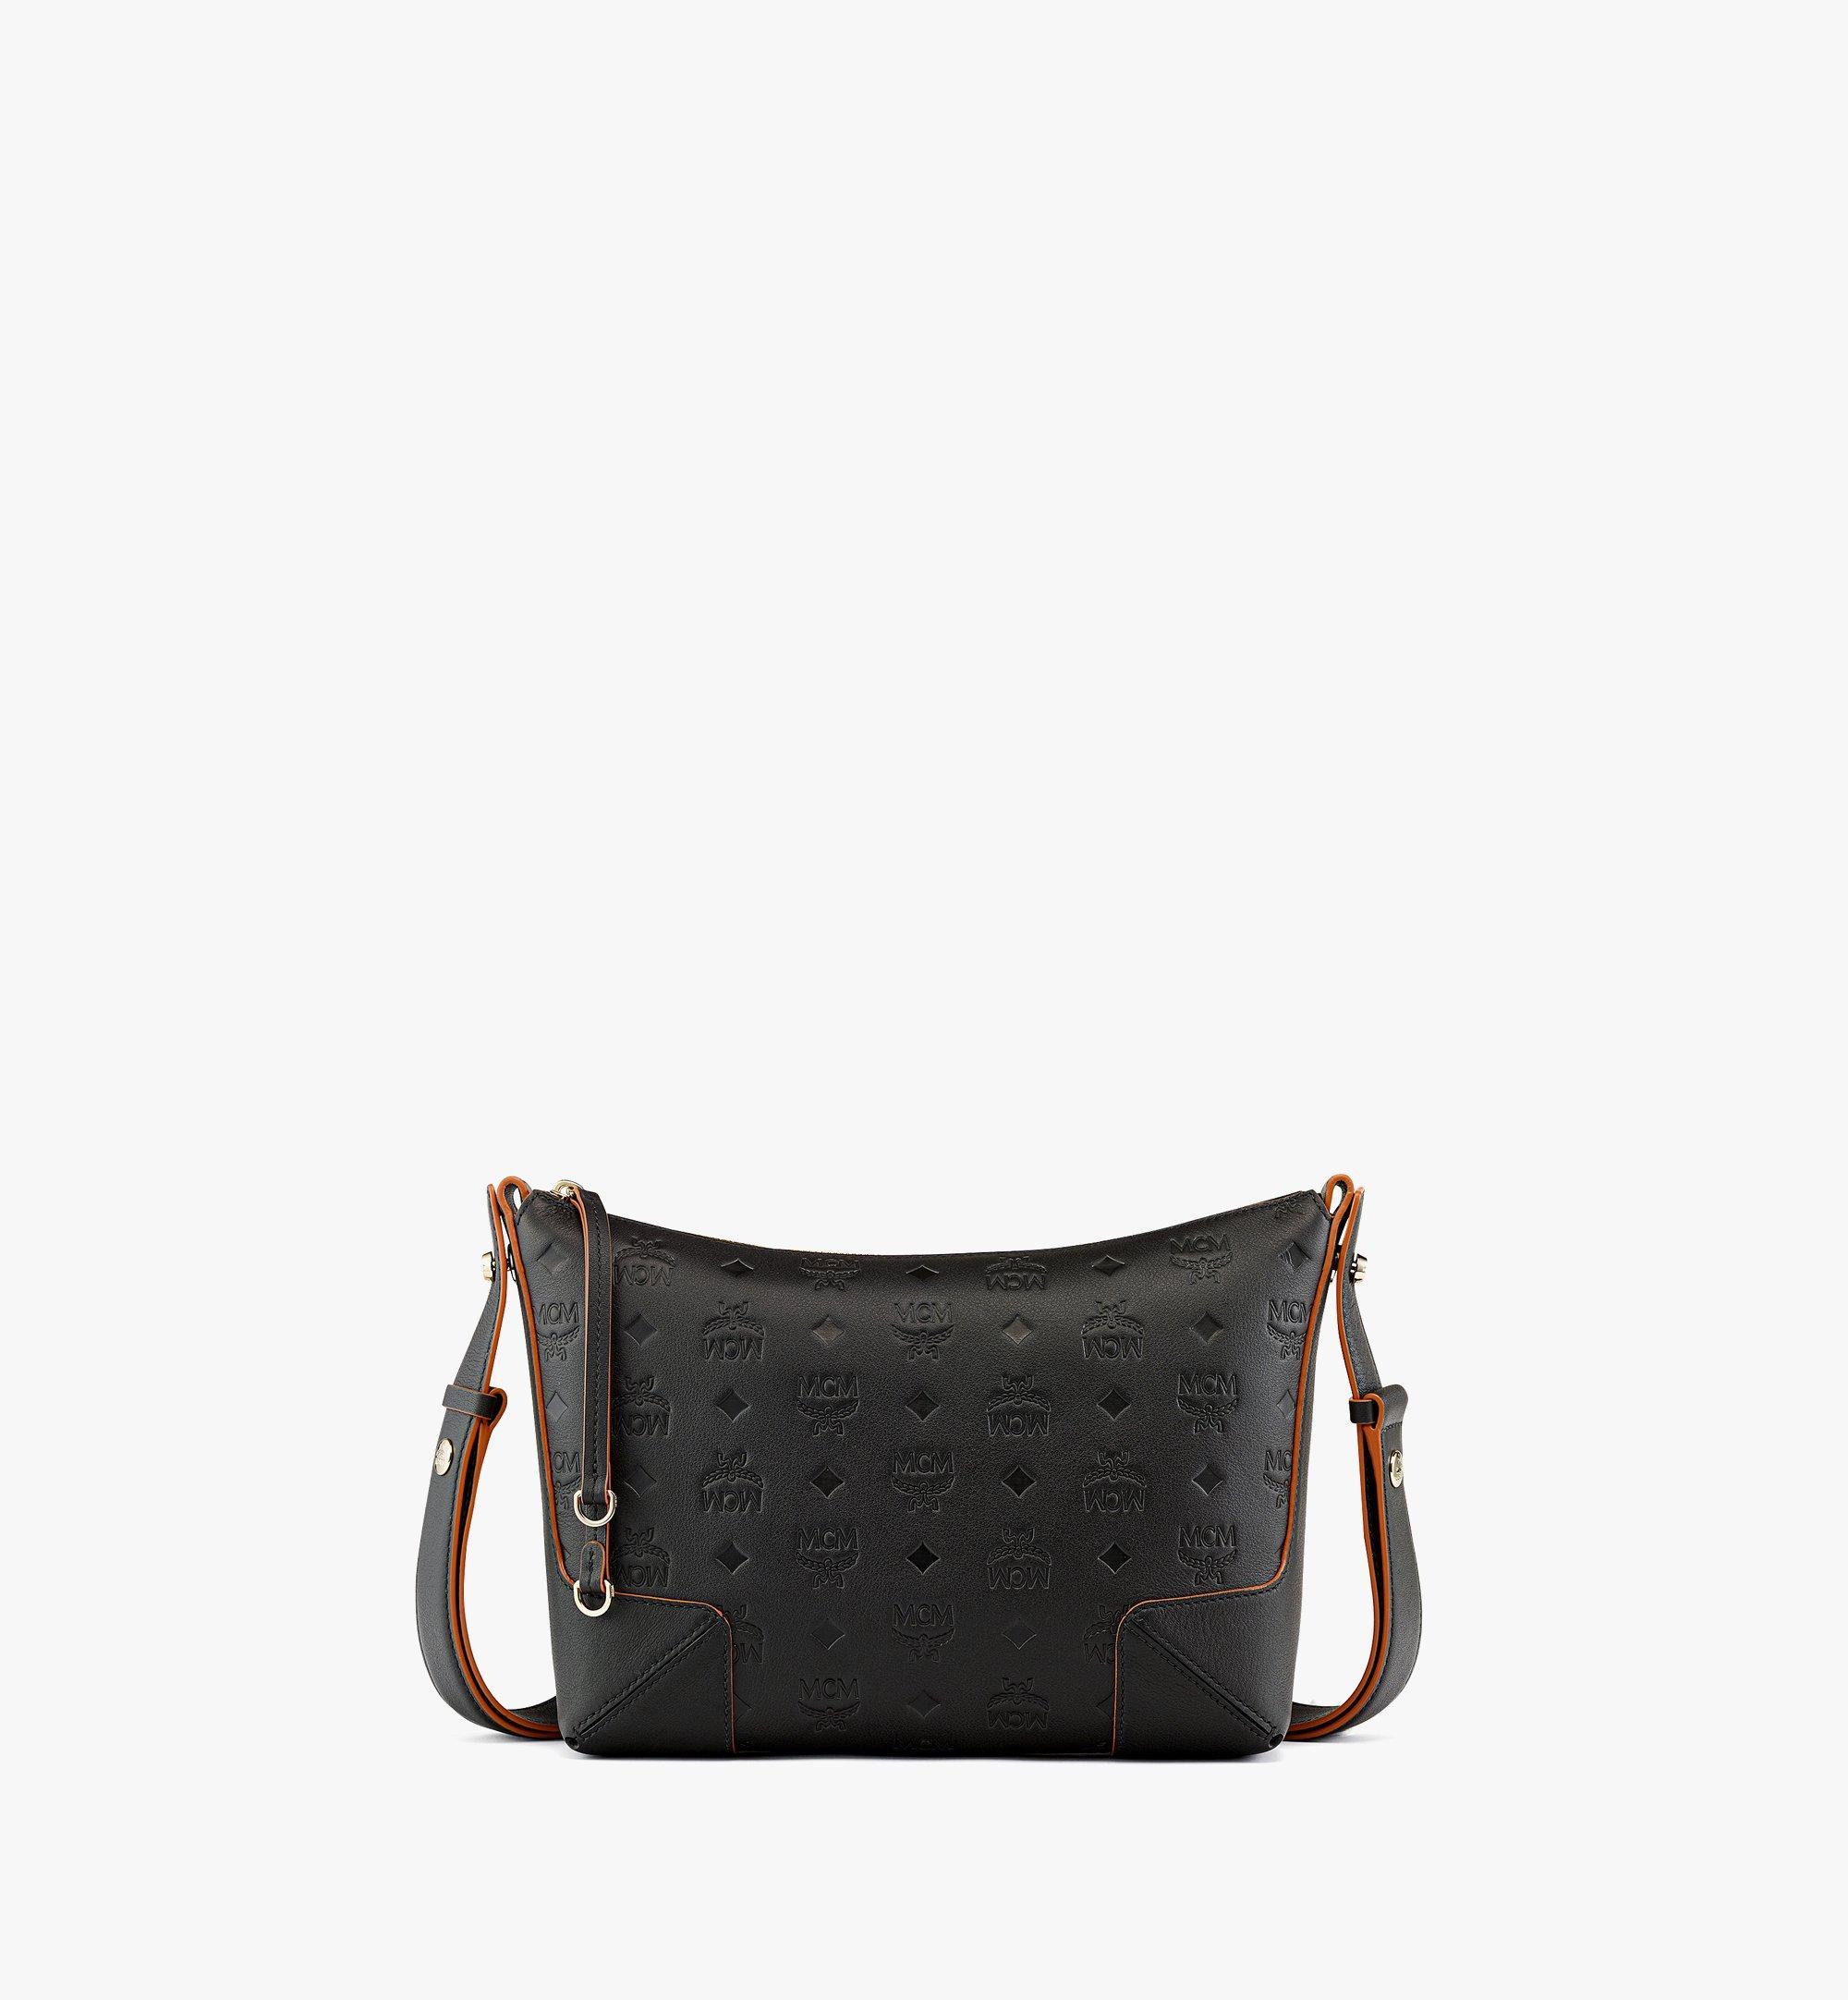 MCM Klara Shoulder Bag in Monogram Leather Black MWSBSKM02BK001 Alternate View 1